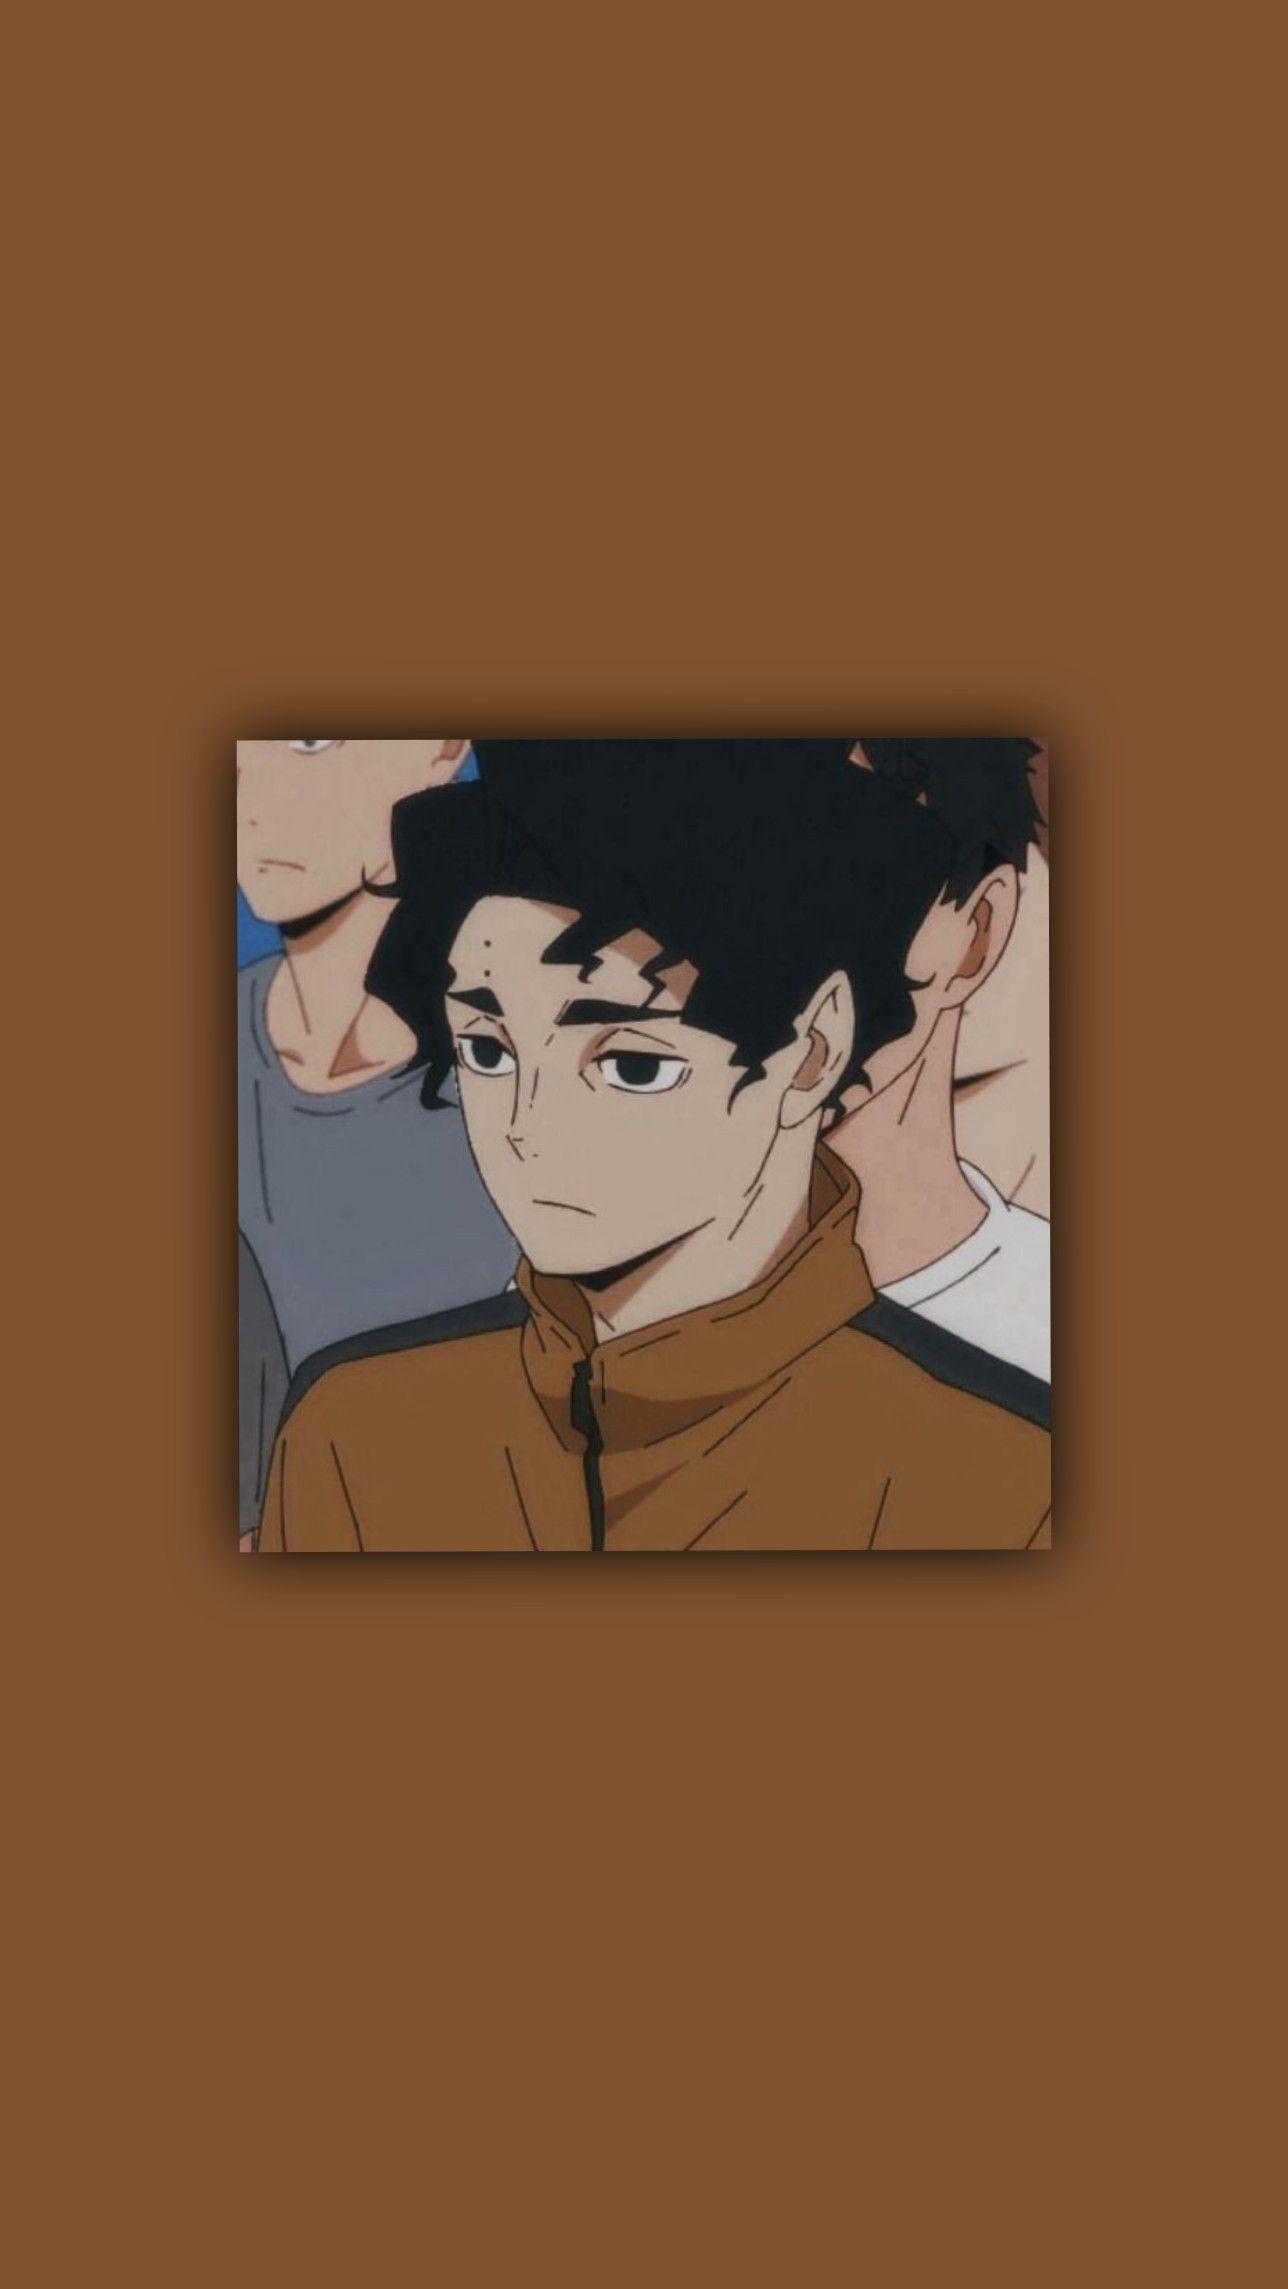 Pin By Ground Zero On Haikyuu Haikyuu Anime Haikyuu Wallpaper Aesthetic Anime